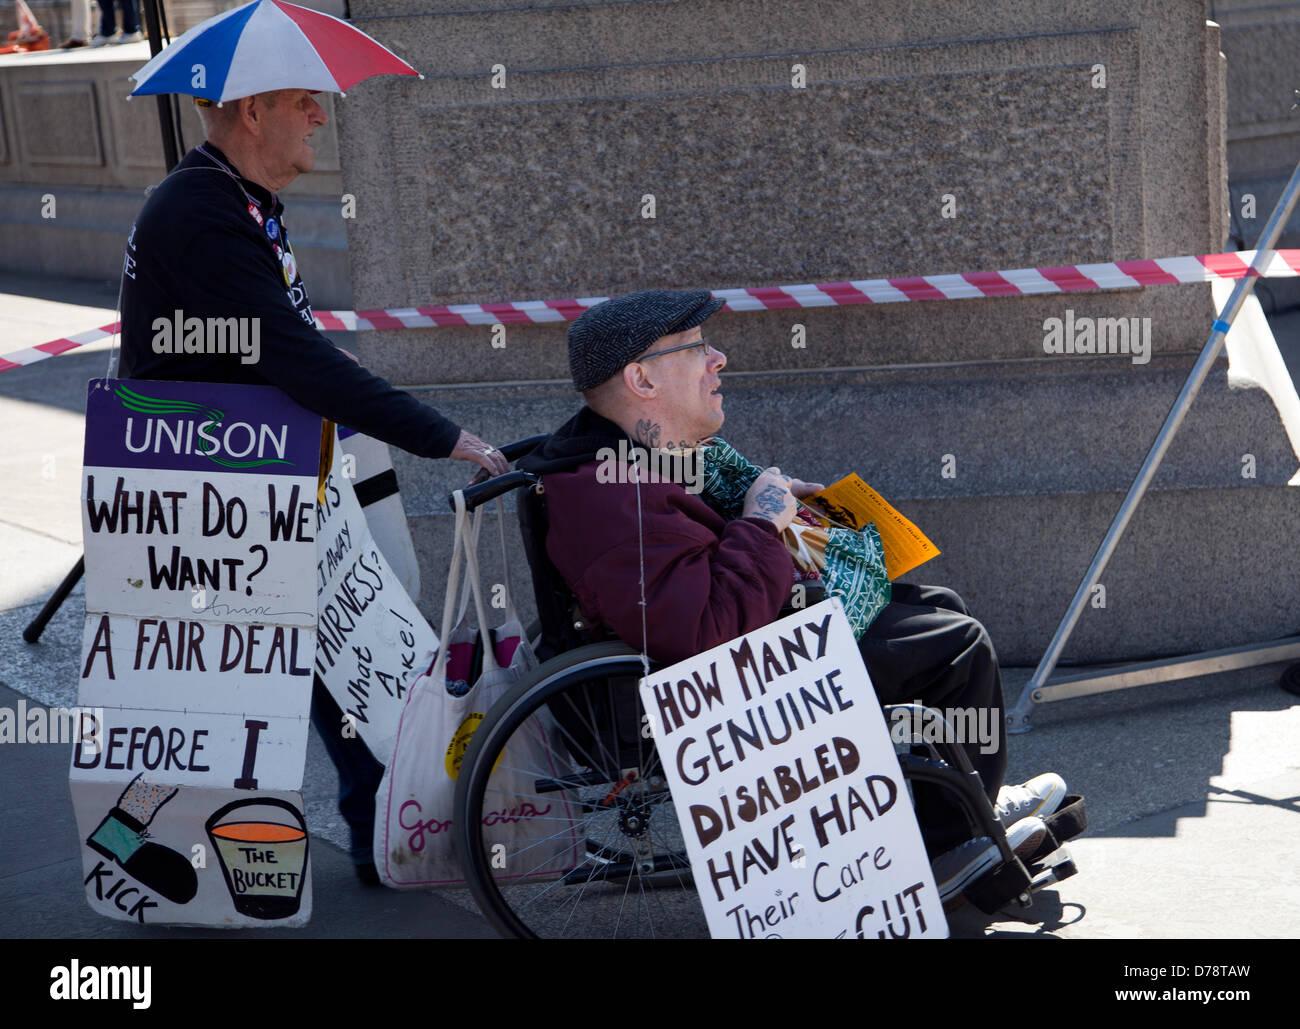 May Day Rally 1 May 2013 - Disability Cuts Campaigners - London UK Stock Photo